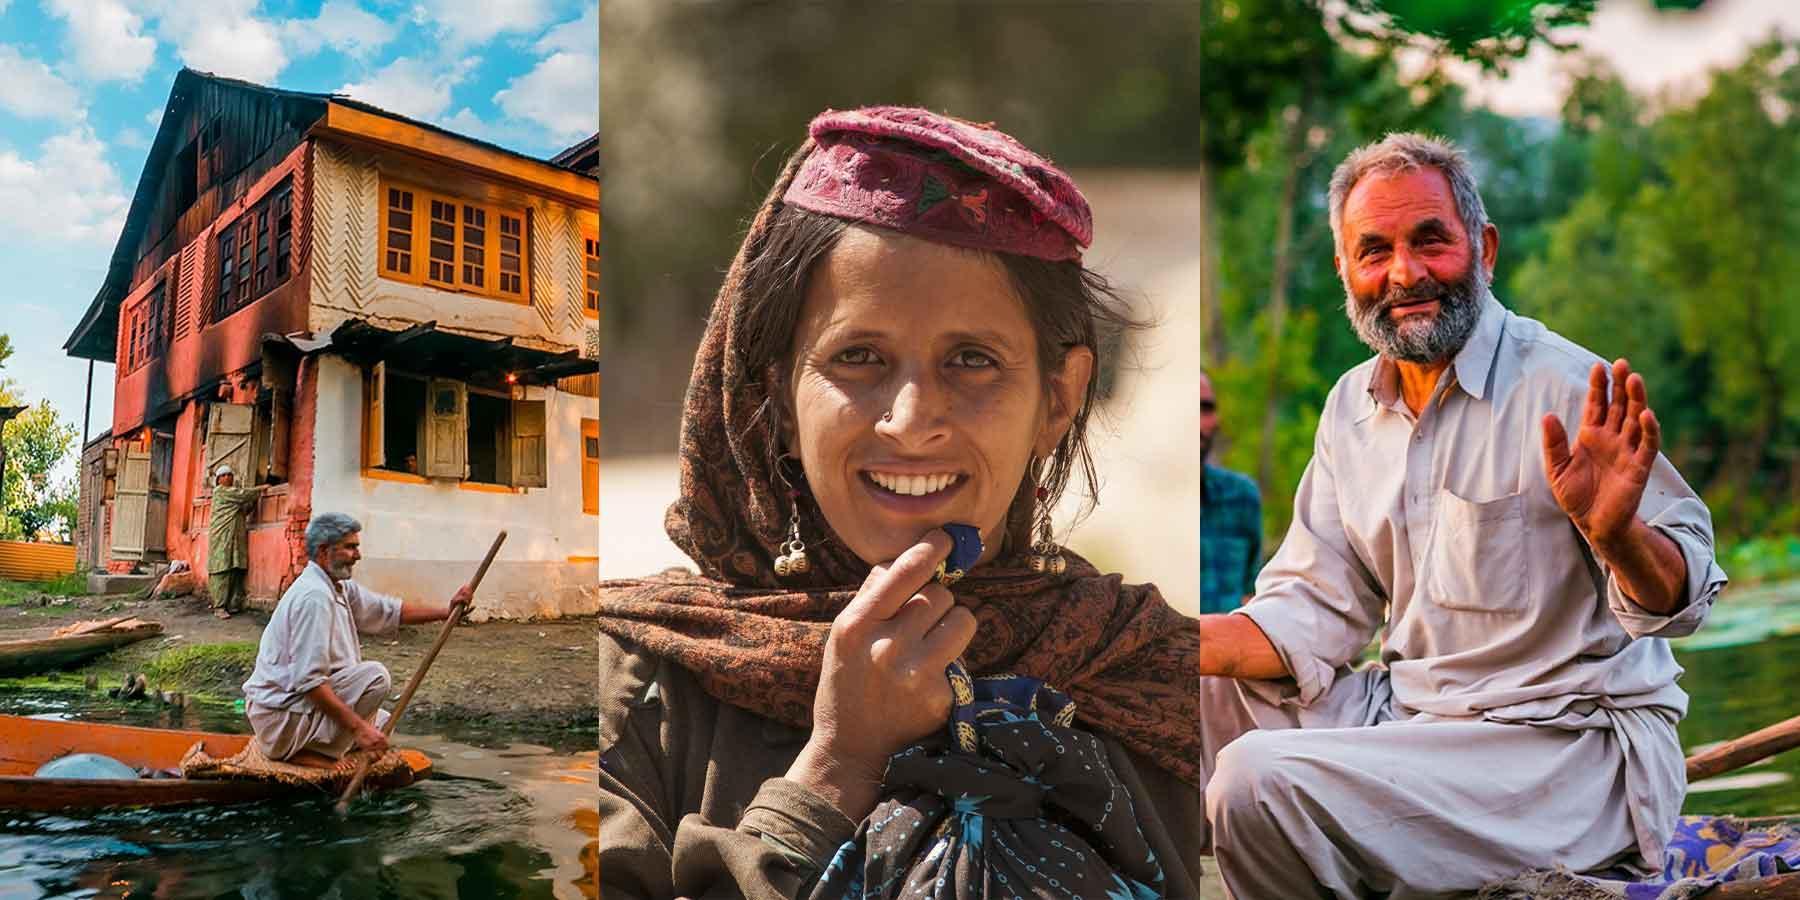 Kashmiri warmth and hospitality